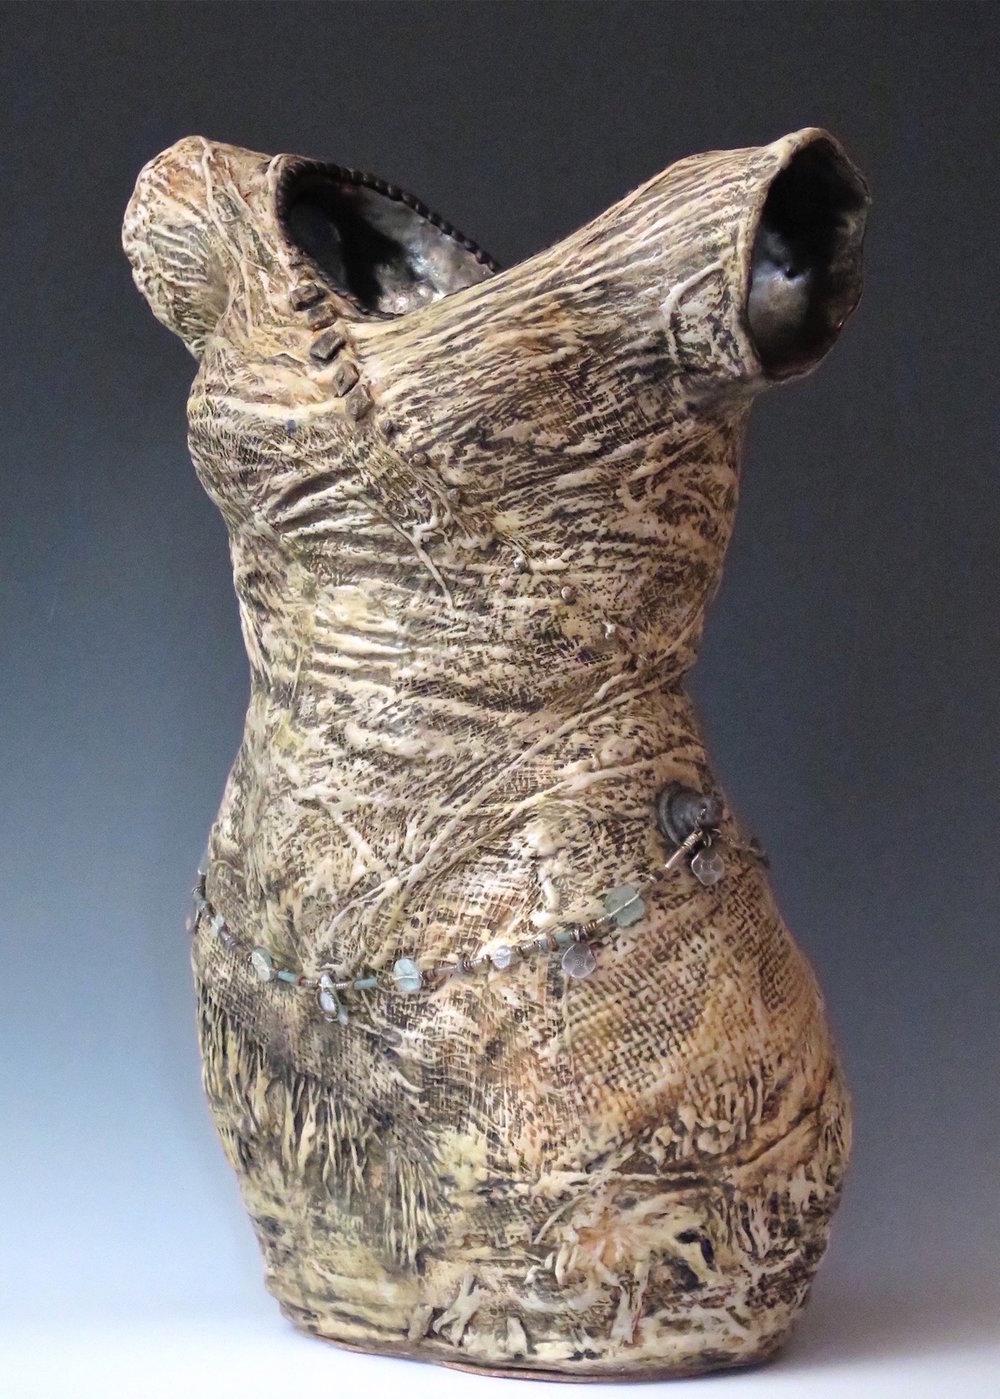 "Rising SpiritShedding Her Skin - Stoneware,slipcast fabric,oxide stains, underglaze,encaustic wax,vintage hardware,roman glass, silver18½"" ×14"" ×9""2015"